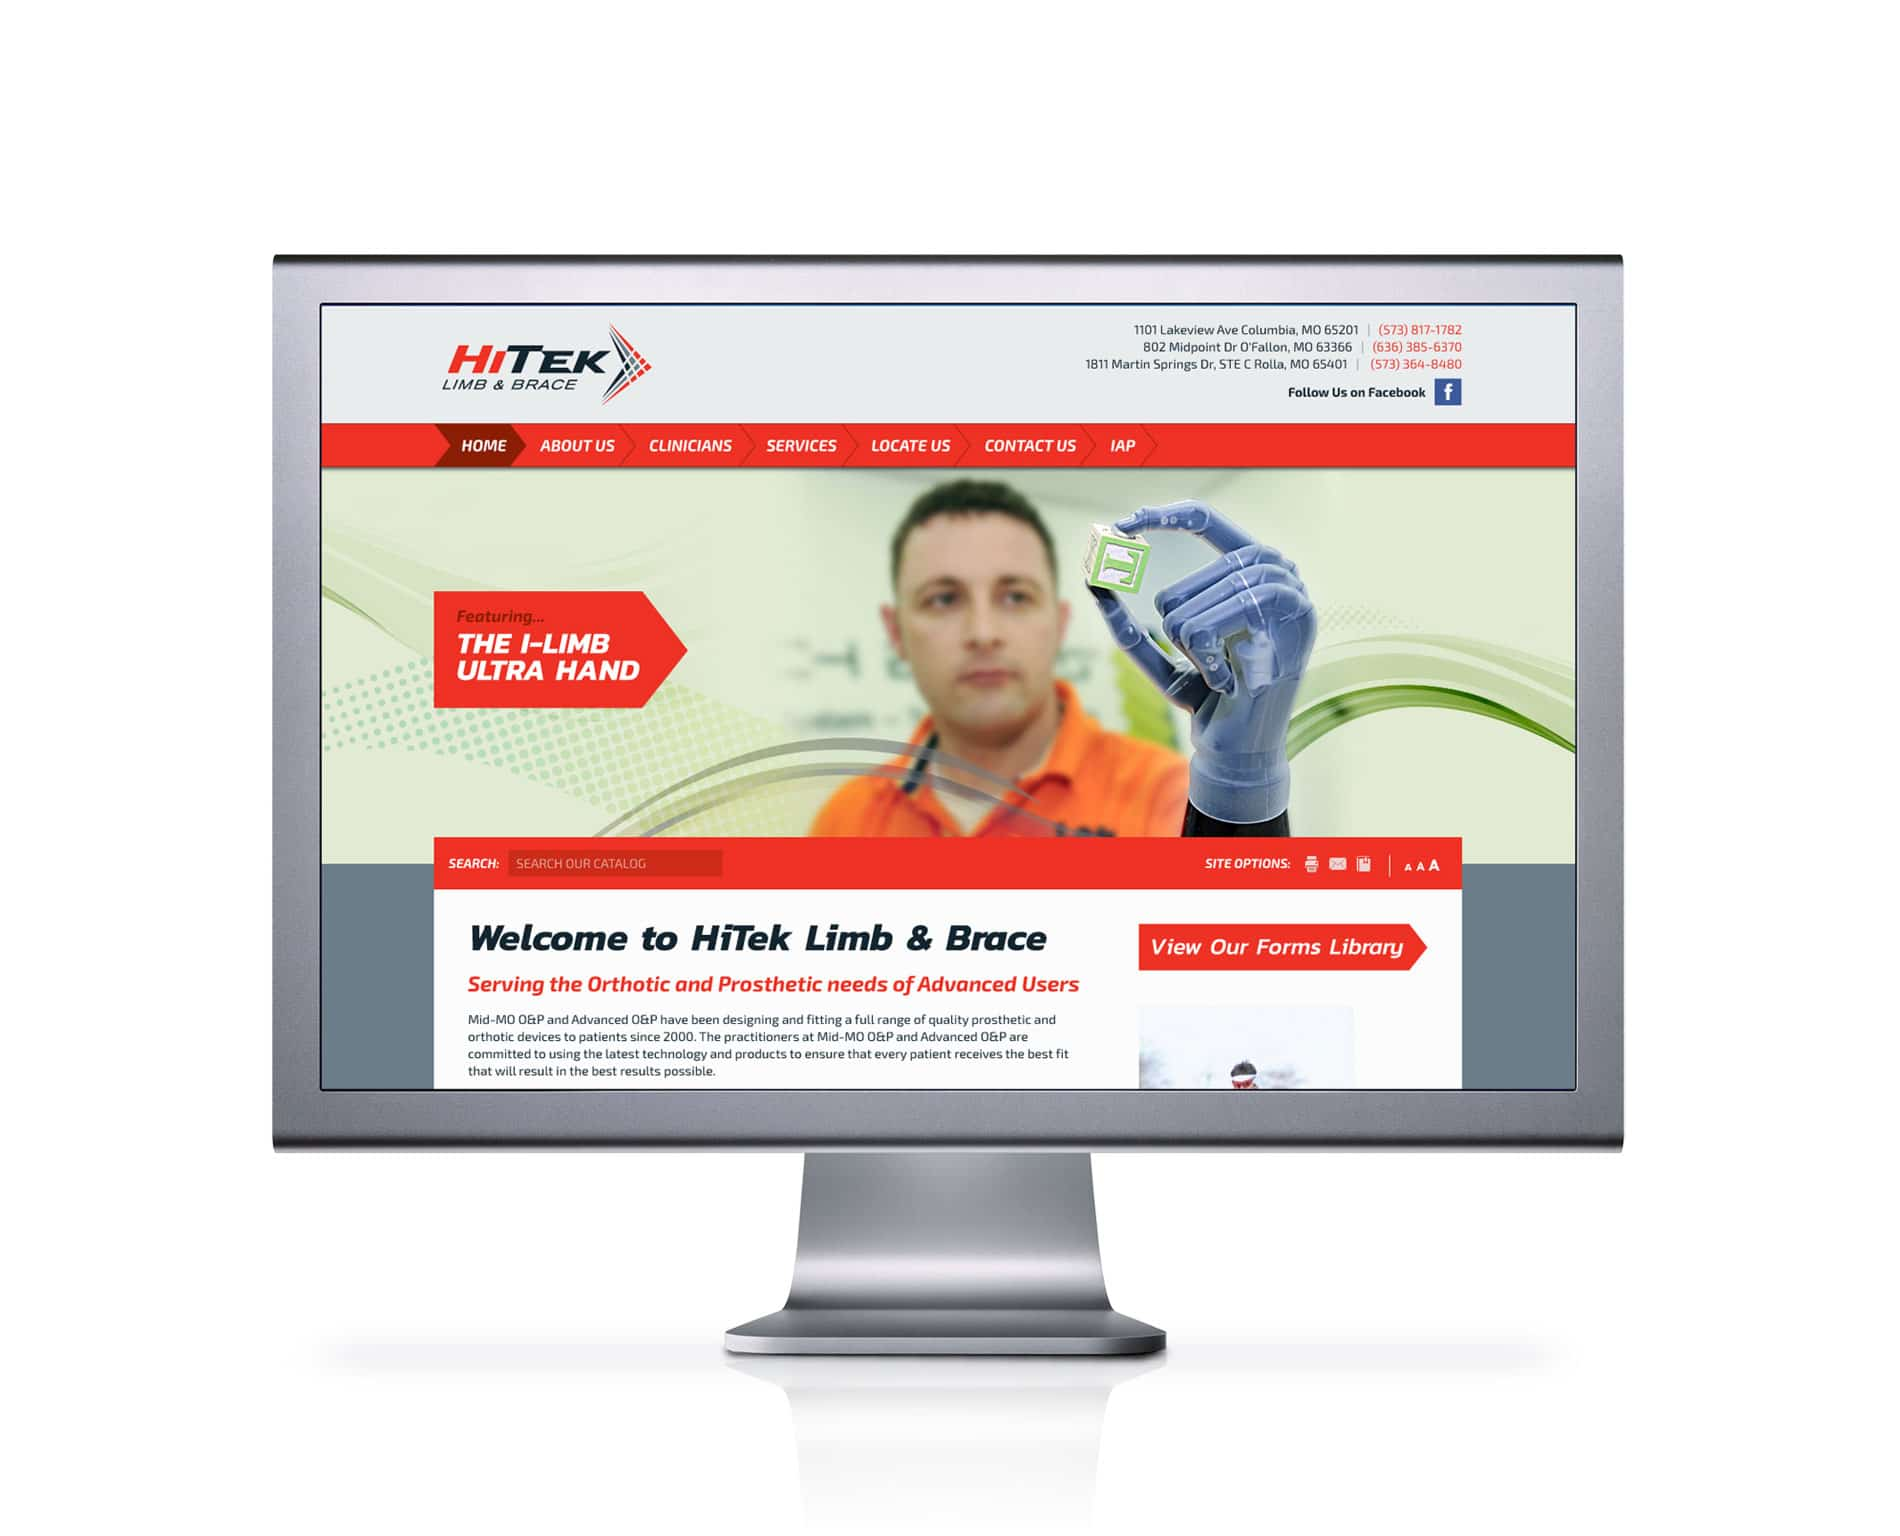 HiTek web design